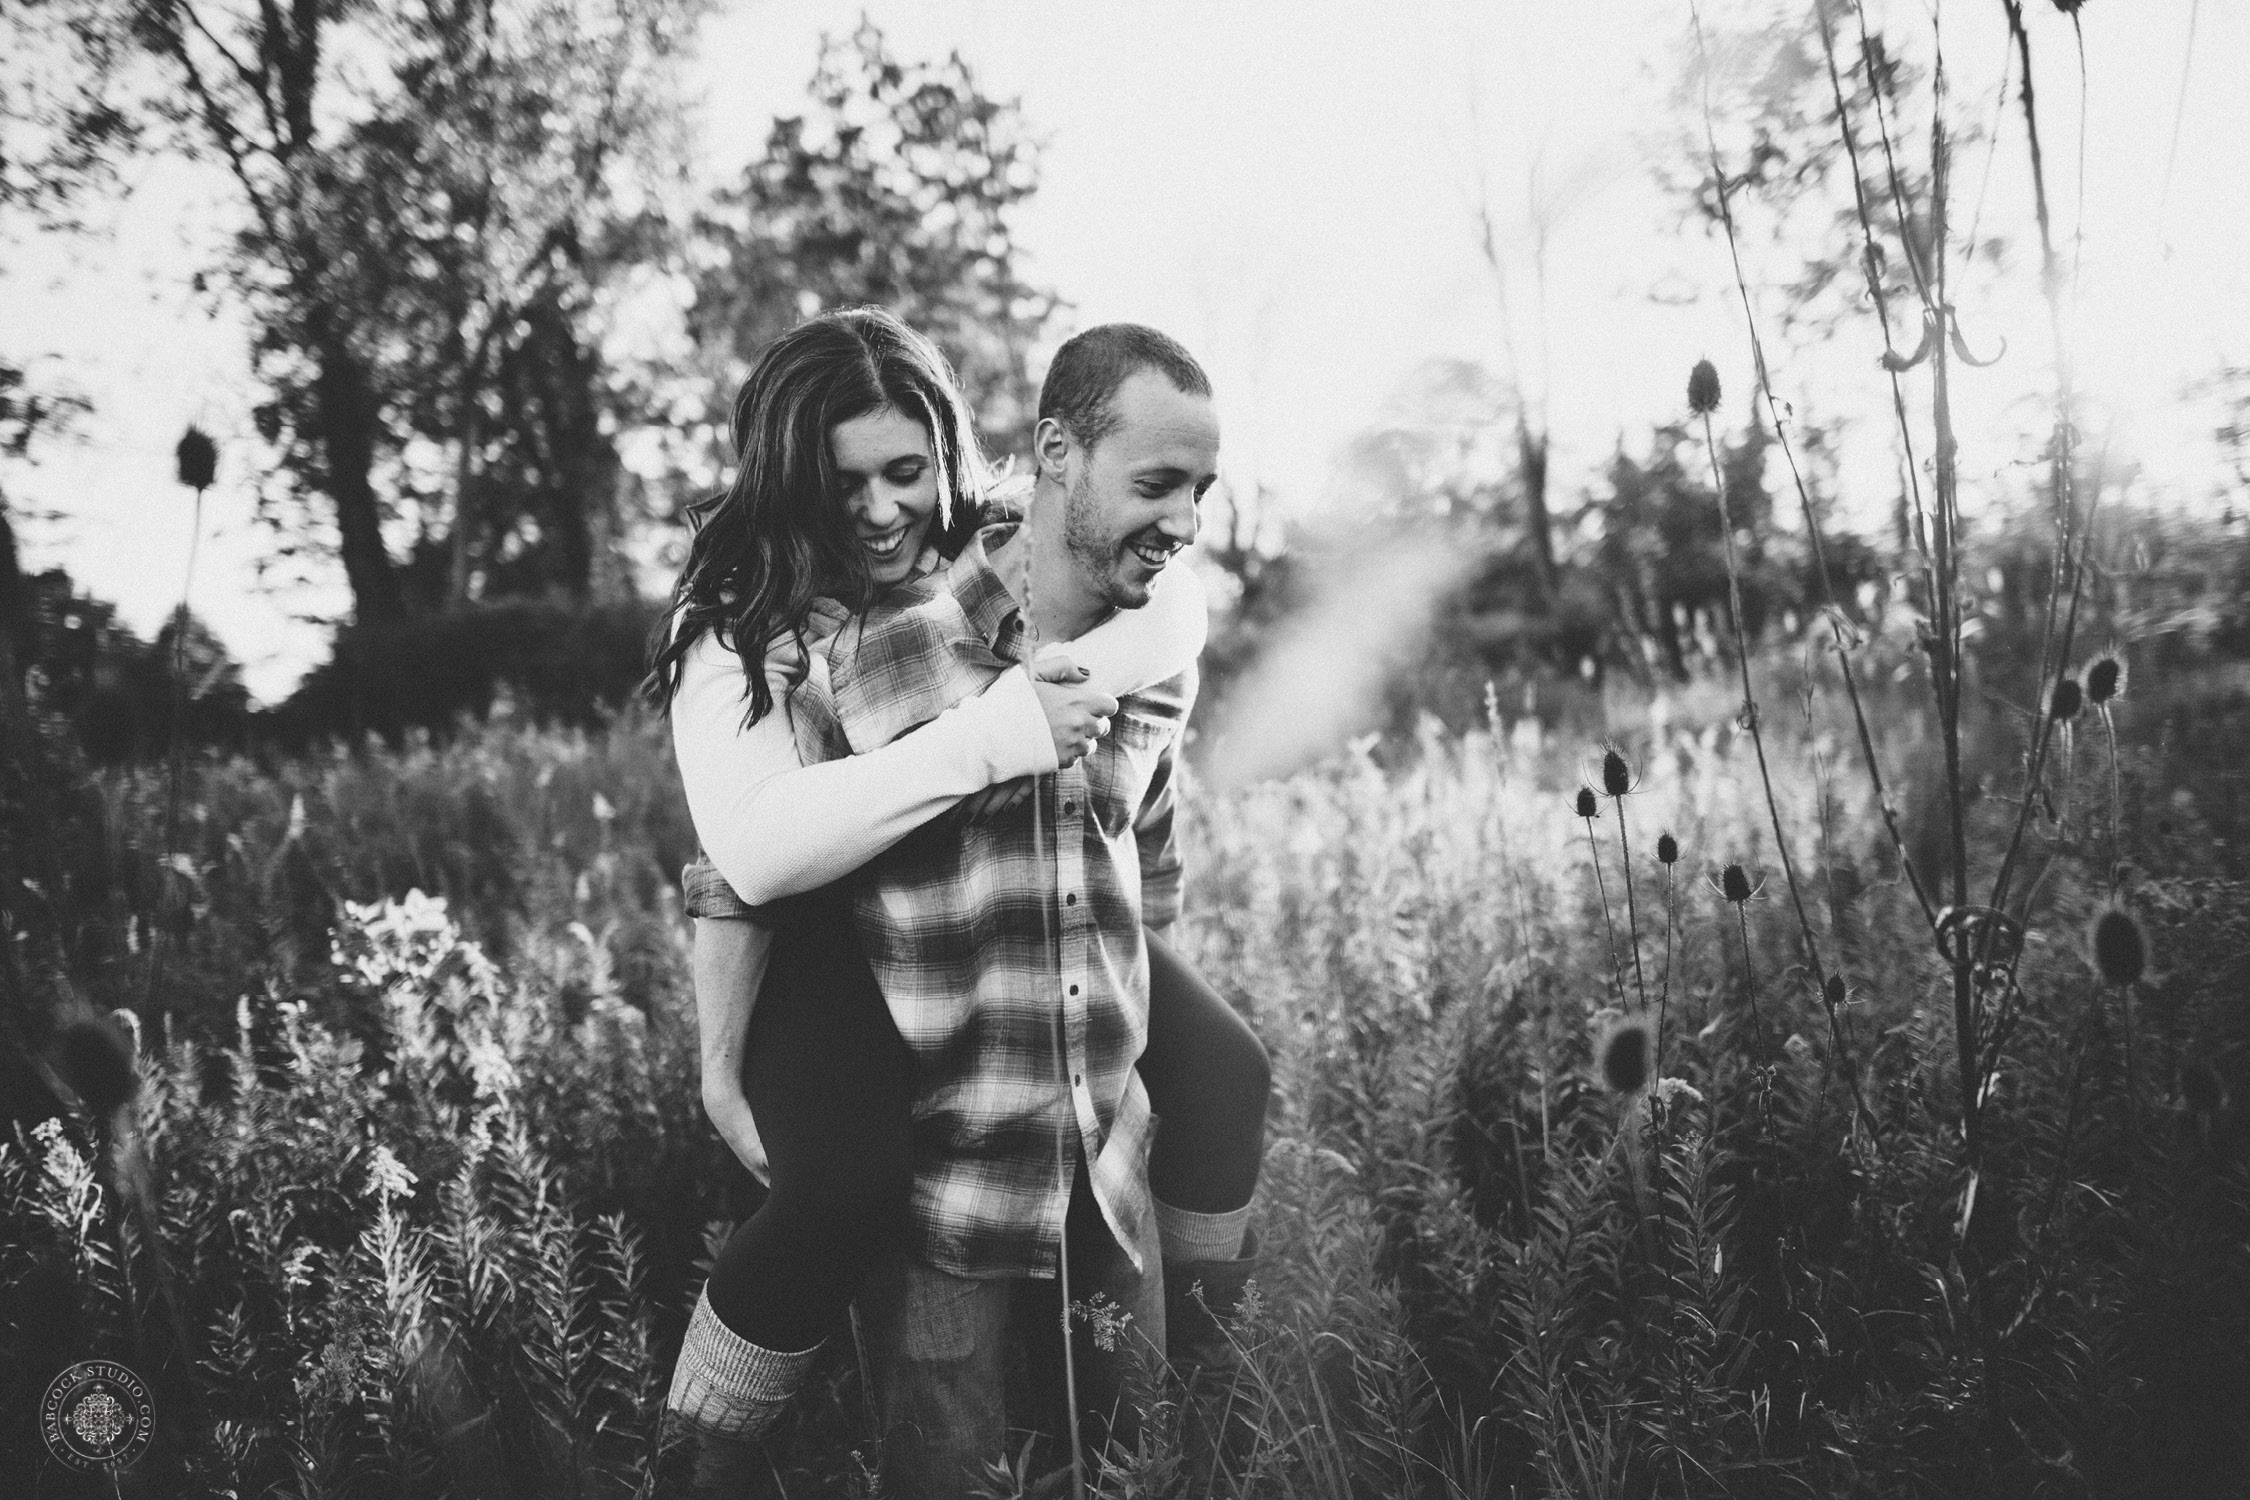 kristen-tom-engagement-photographer-dayton-ohio-fb-8.jpg